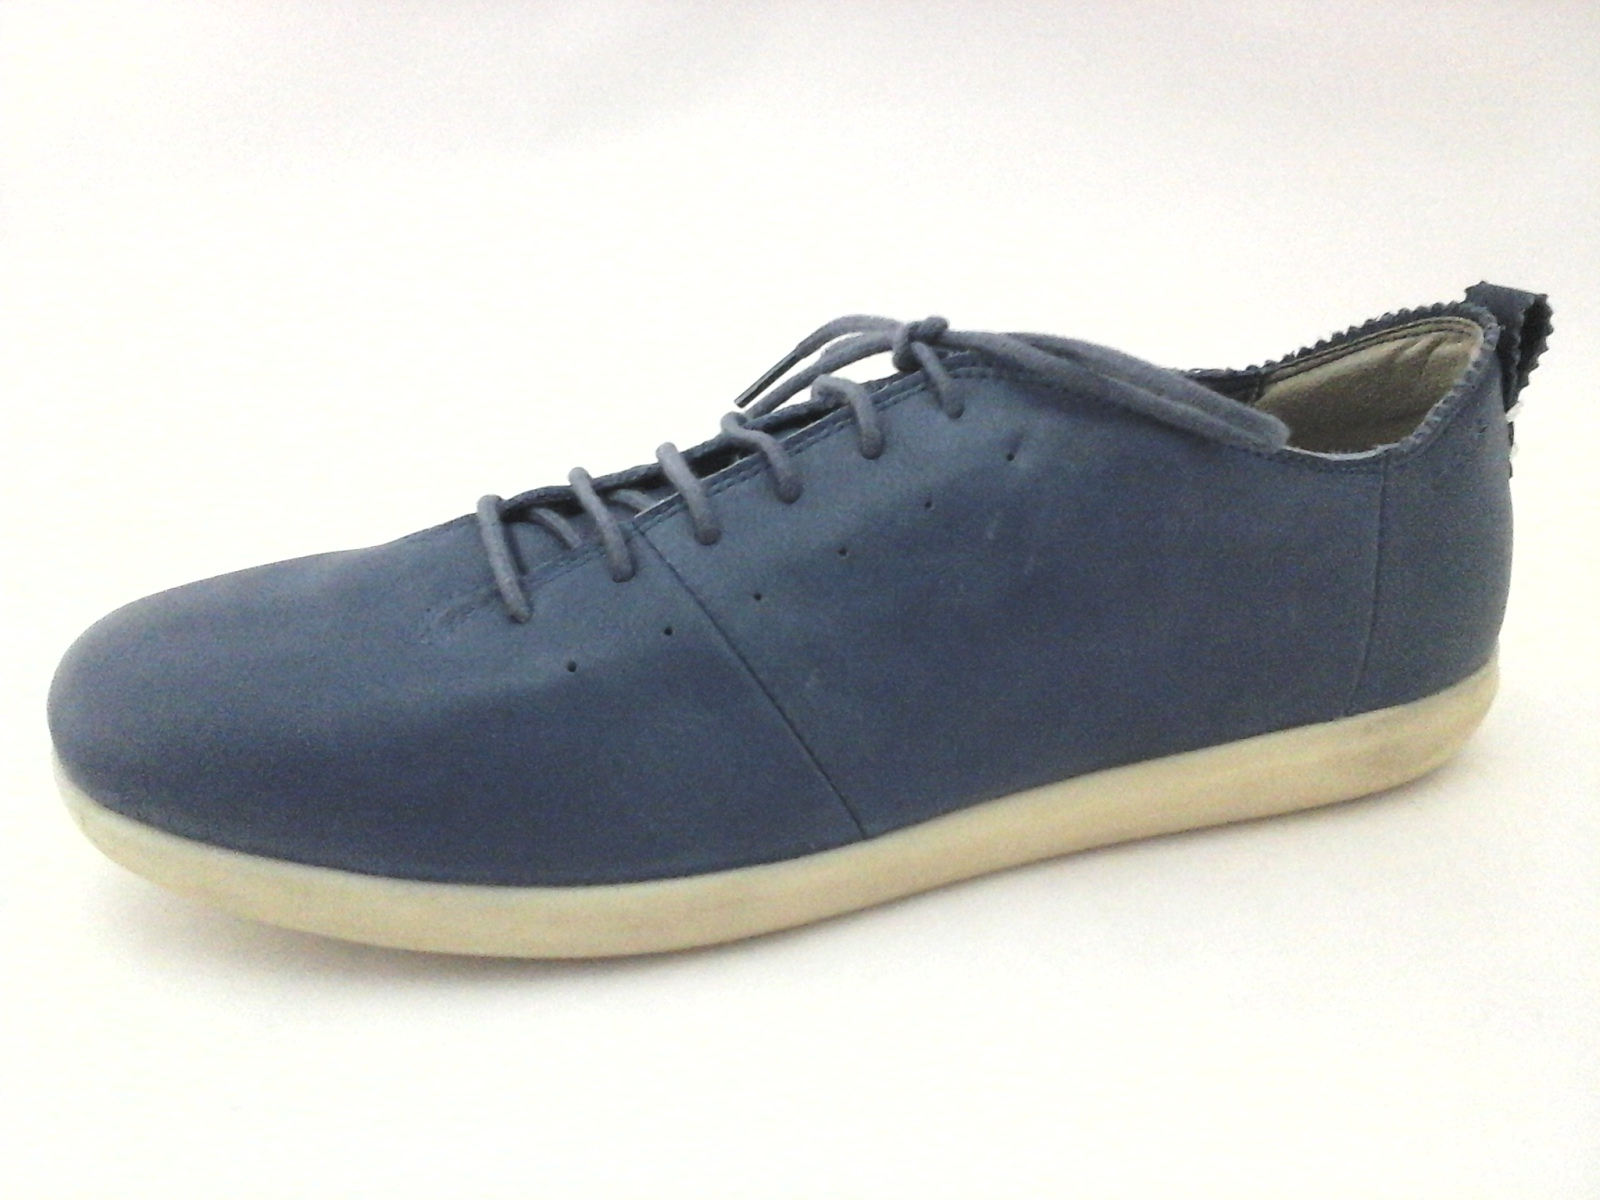 3fef4f0b22 Geox Respira New Do Women s Walking Casual Comfort Oxford Shoes Blue US 9    39